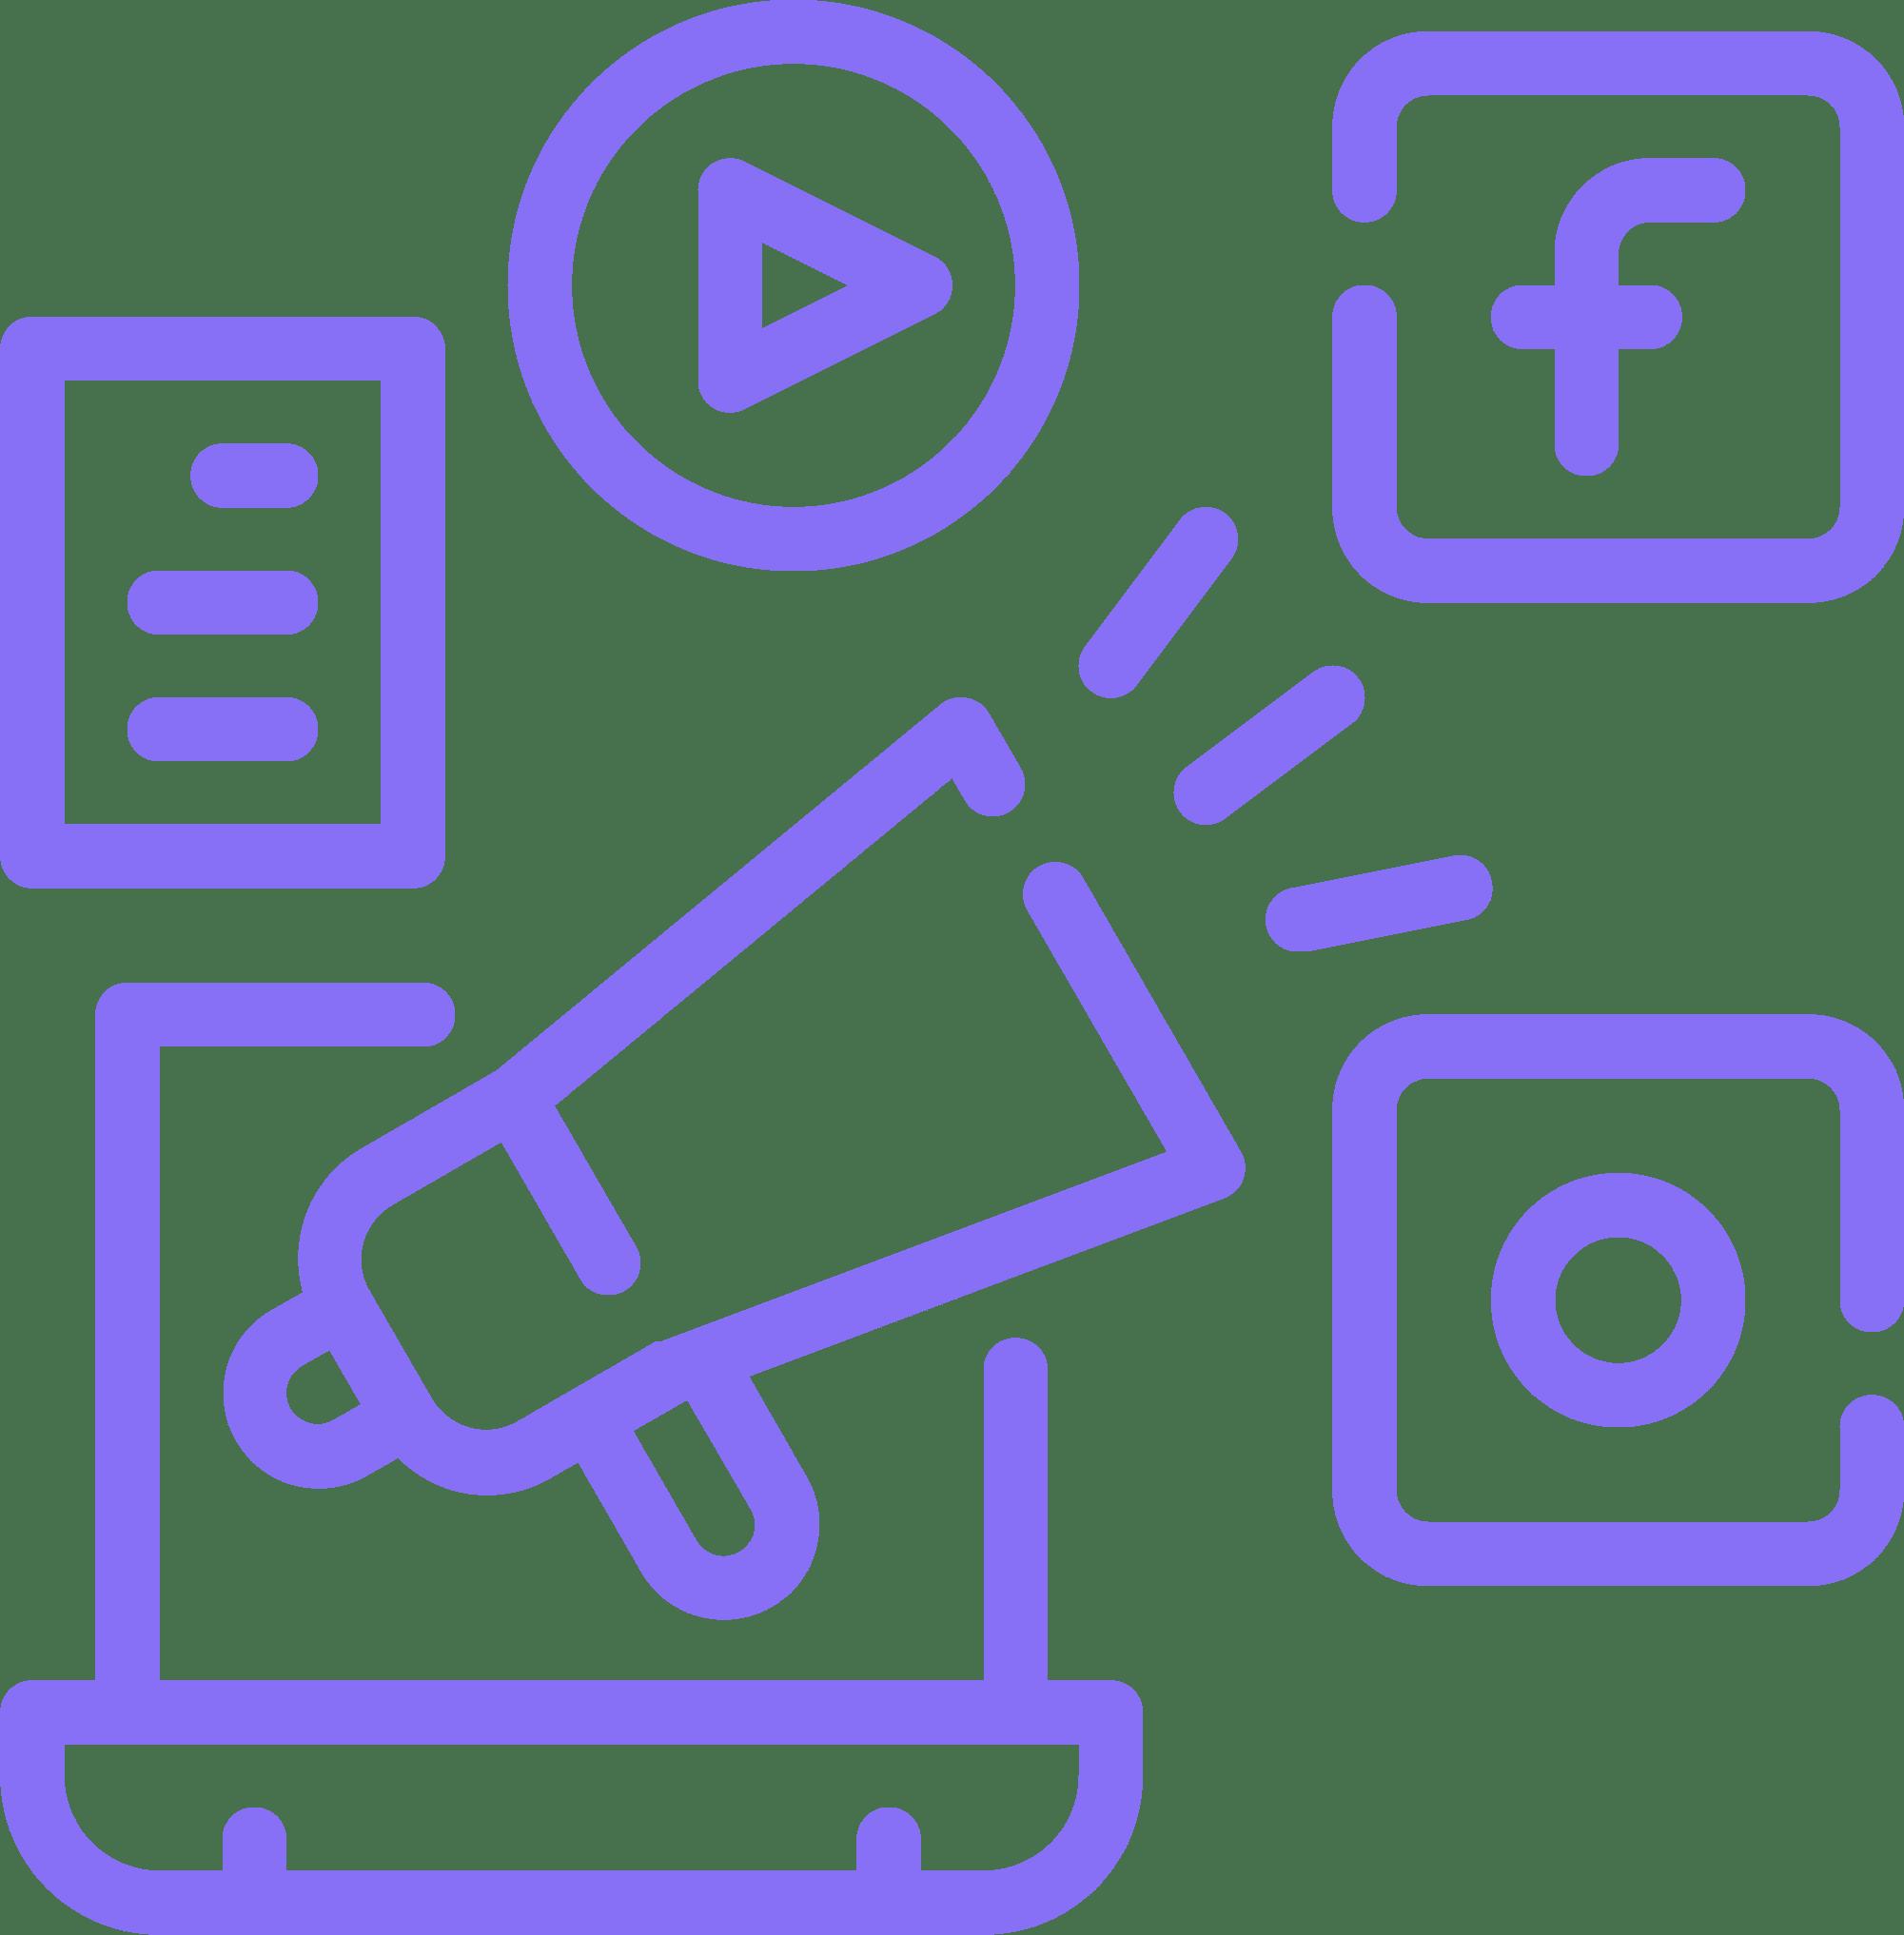 marketing icon with social media logos